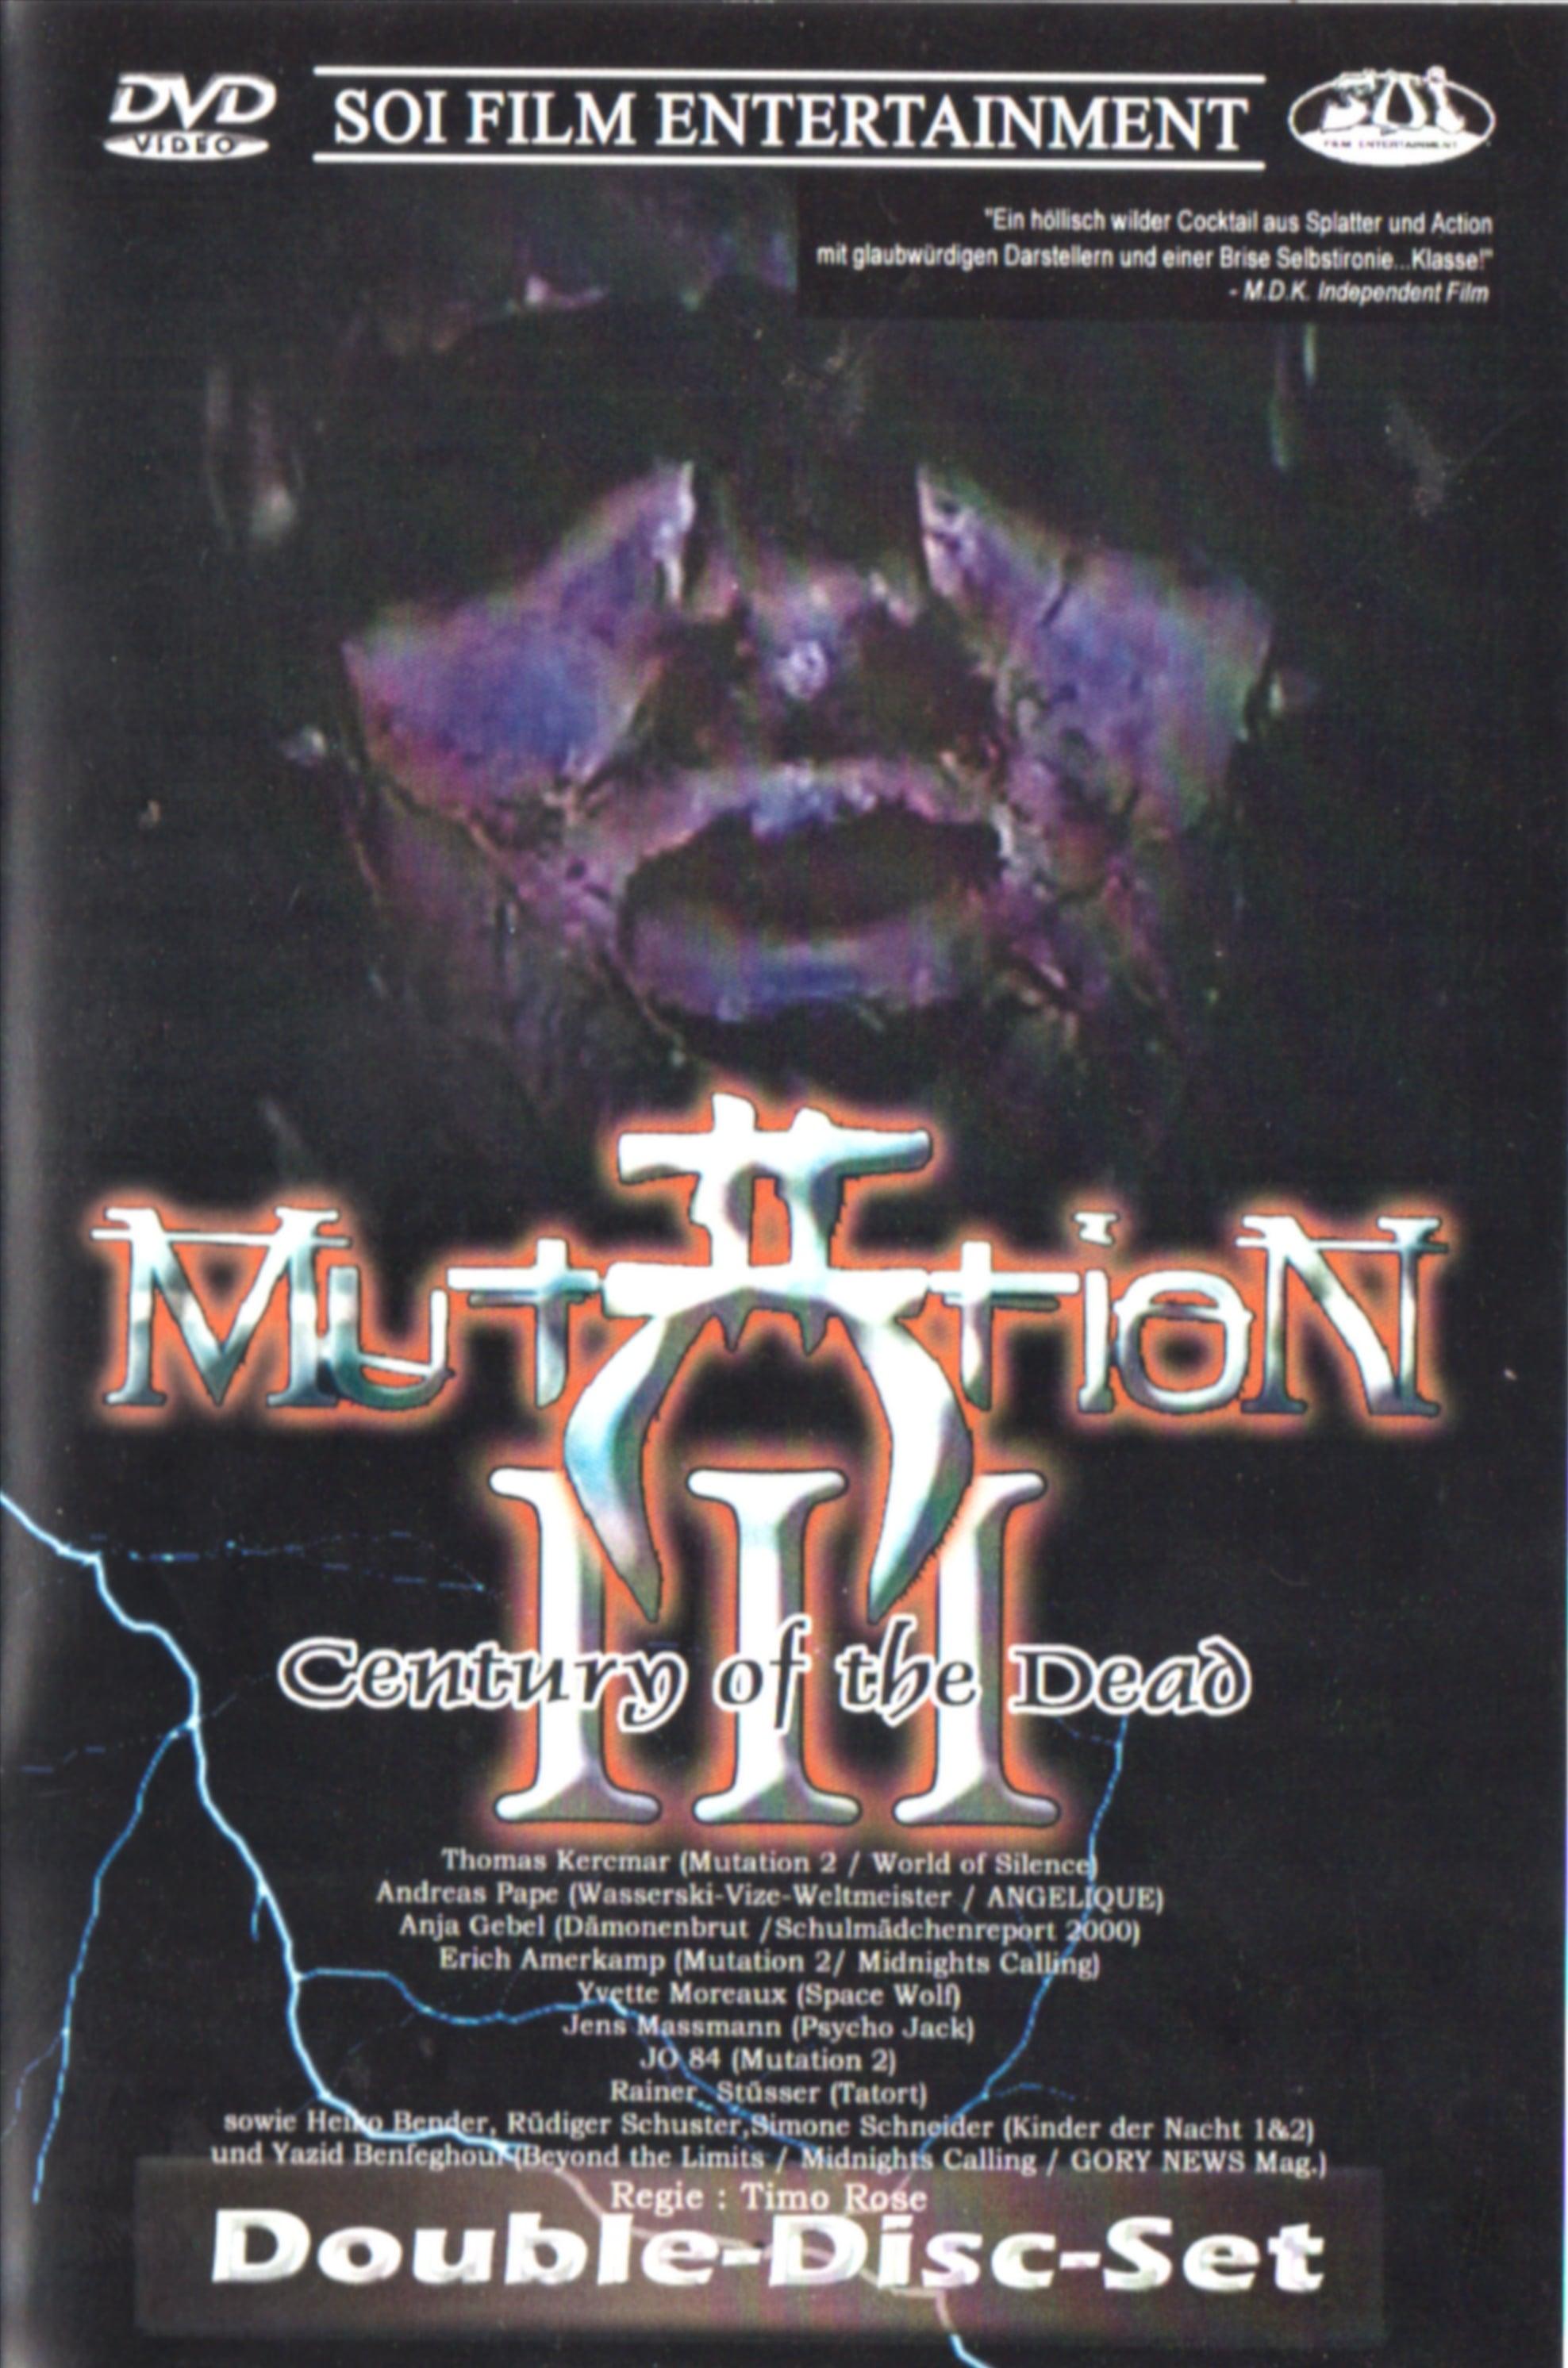 M III: Century of the Dead